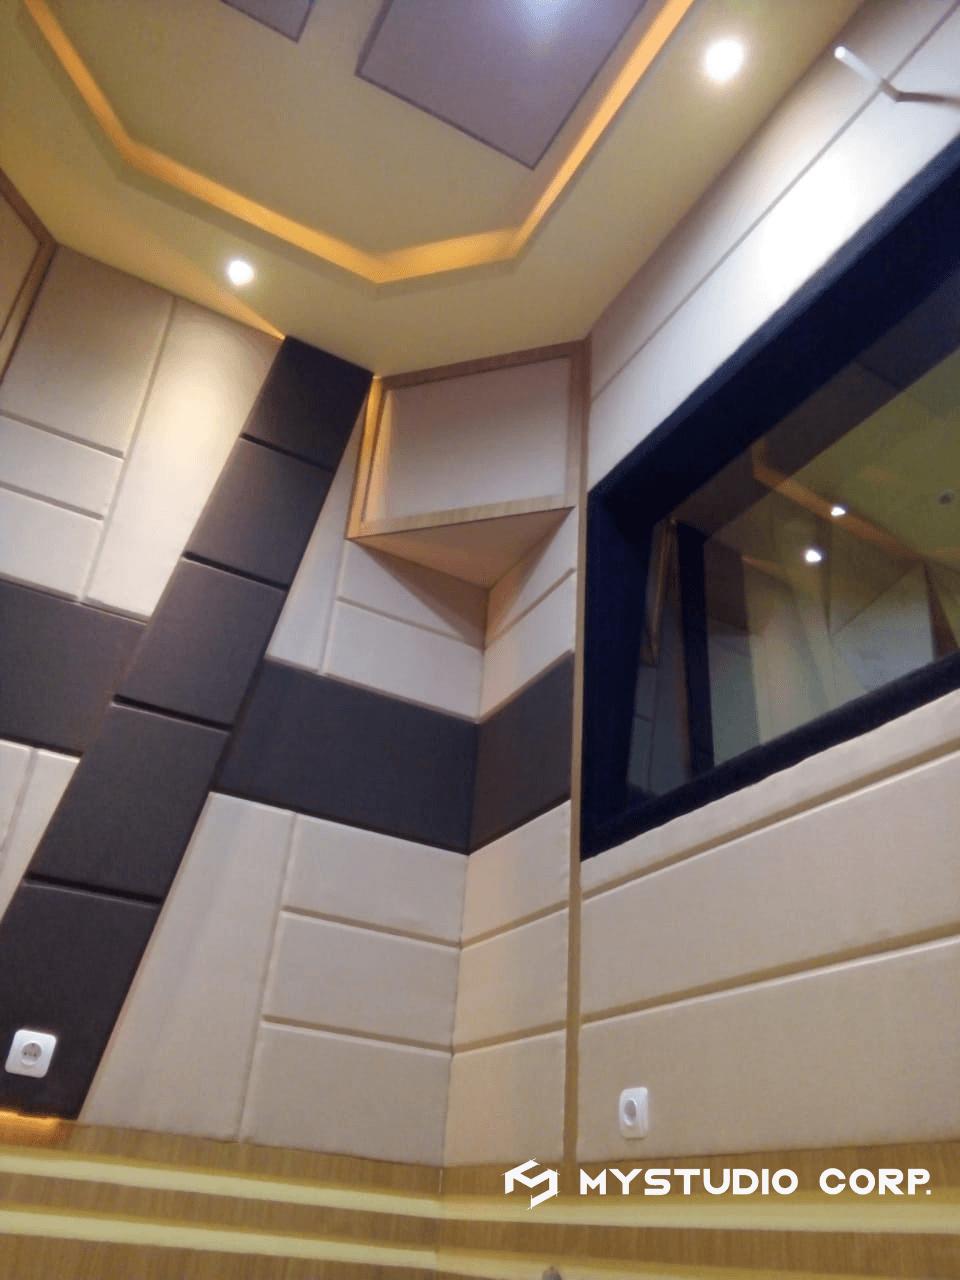 Mystudio.corp Studio Musik Cikarang Cikarang, Bekasi, Jawa Barat, Indonesia Cikarang, Bekasi, Jawa Barat, Indonesia Mystudiocorp-Studio-Musik-Cikarang   81511